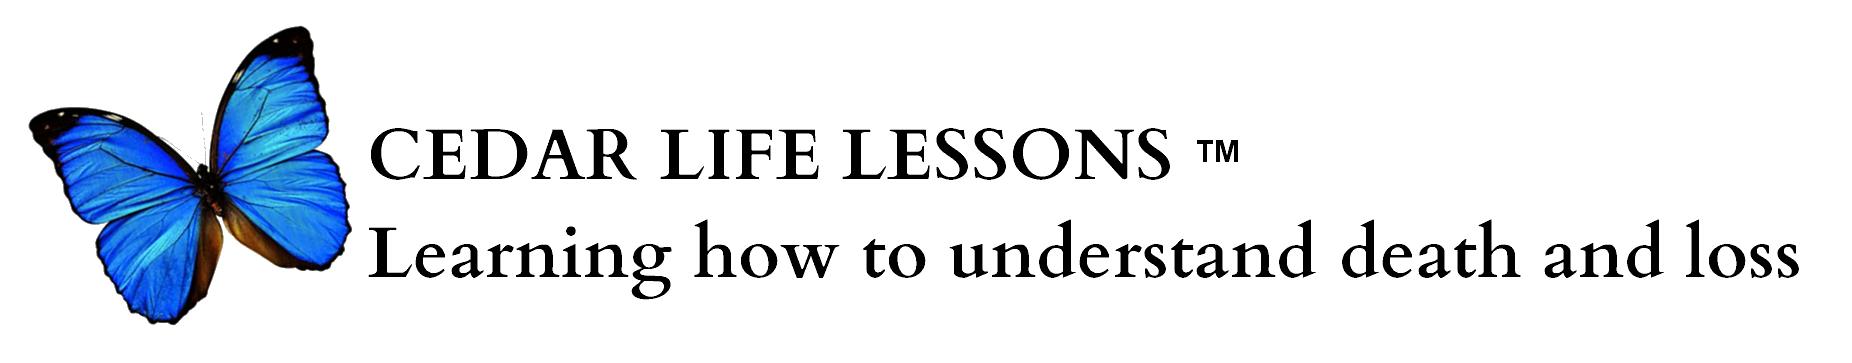 CEDAR Life Lessons